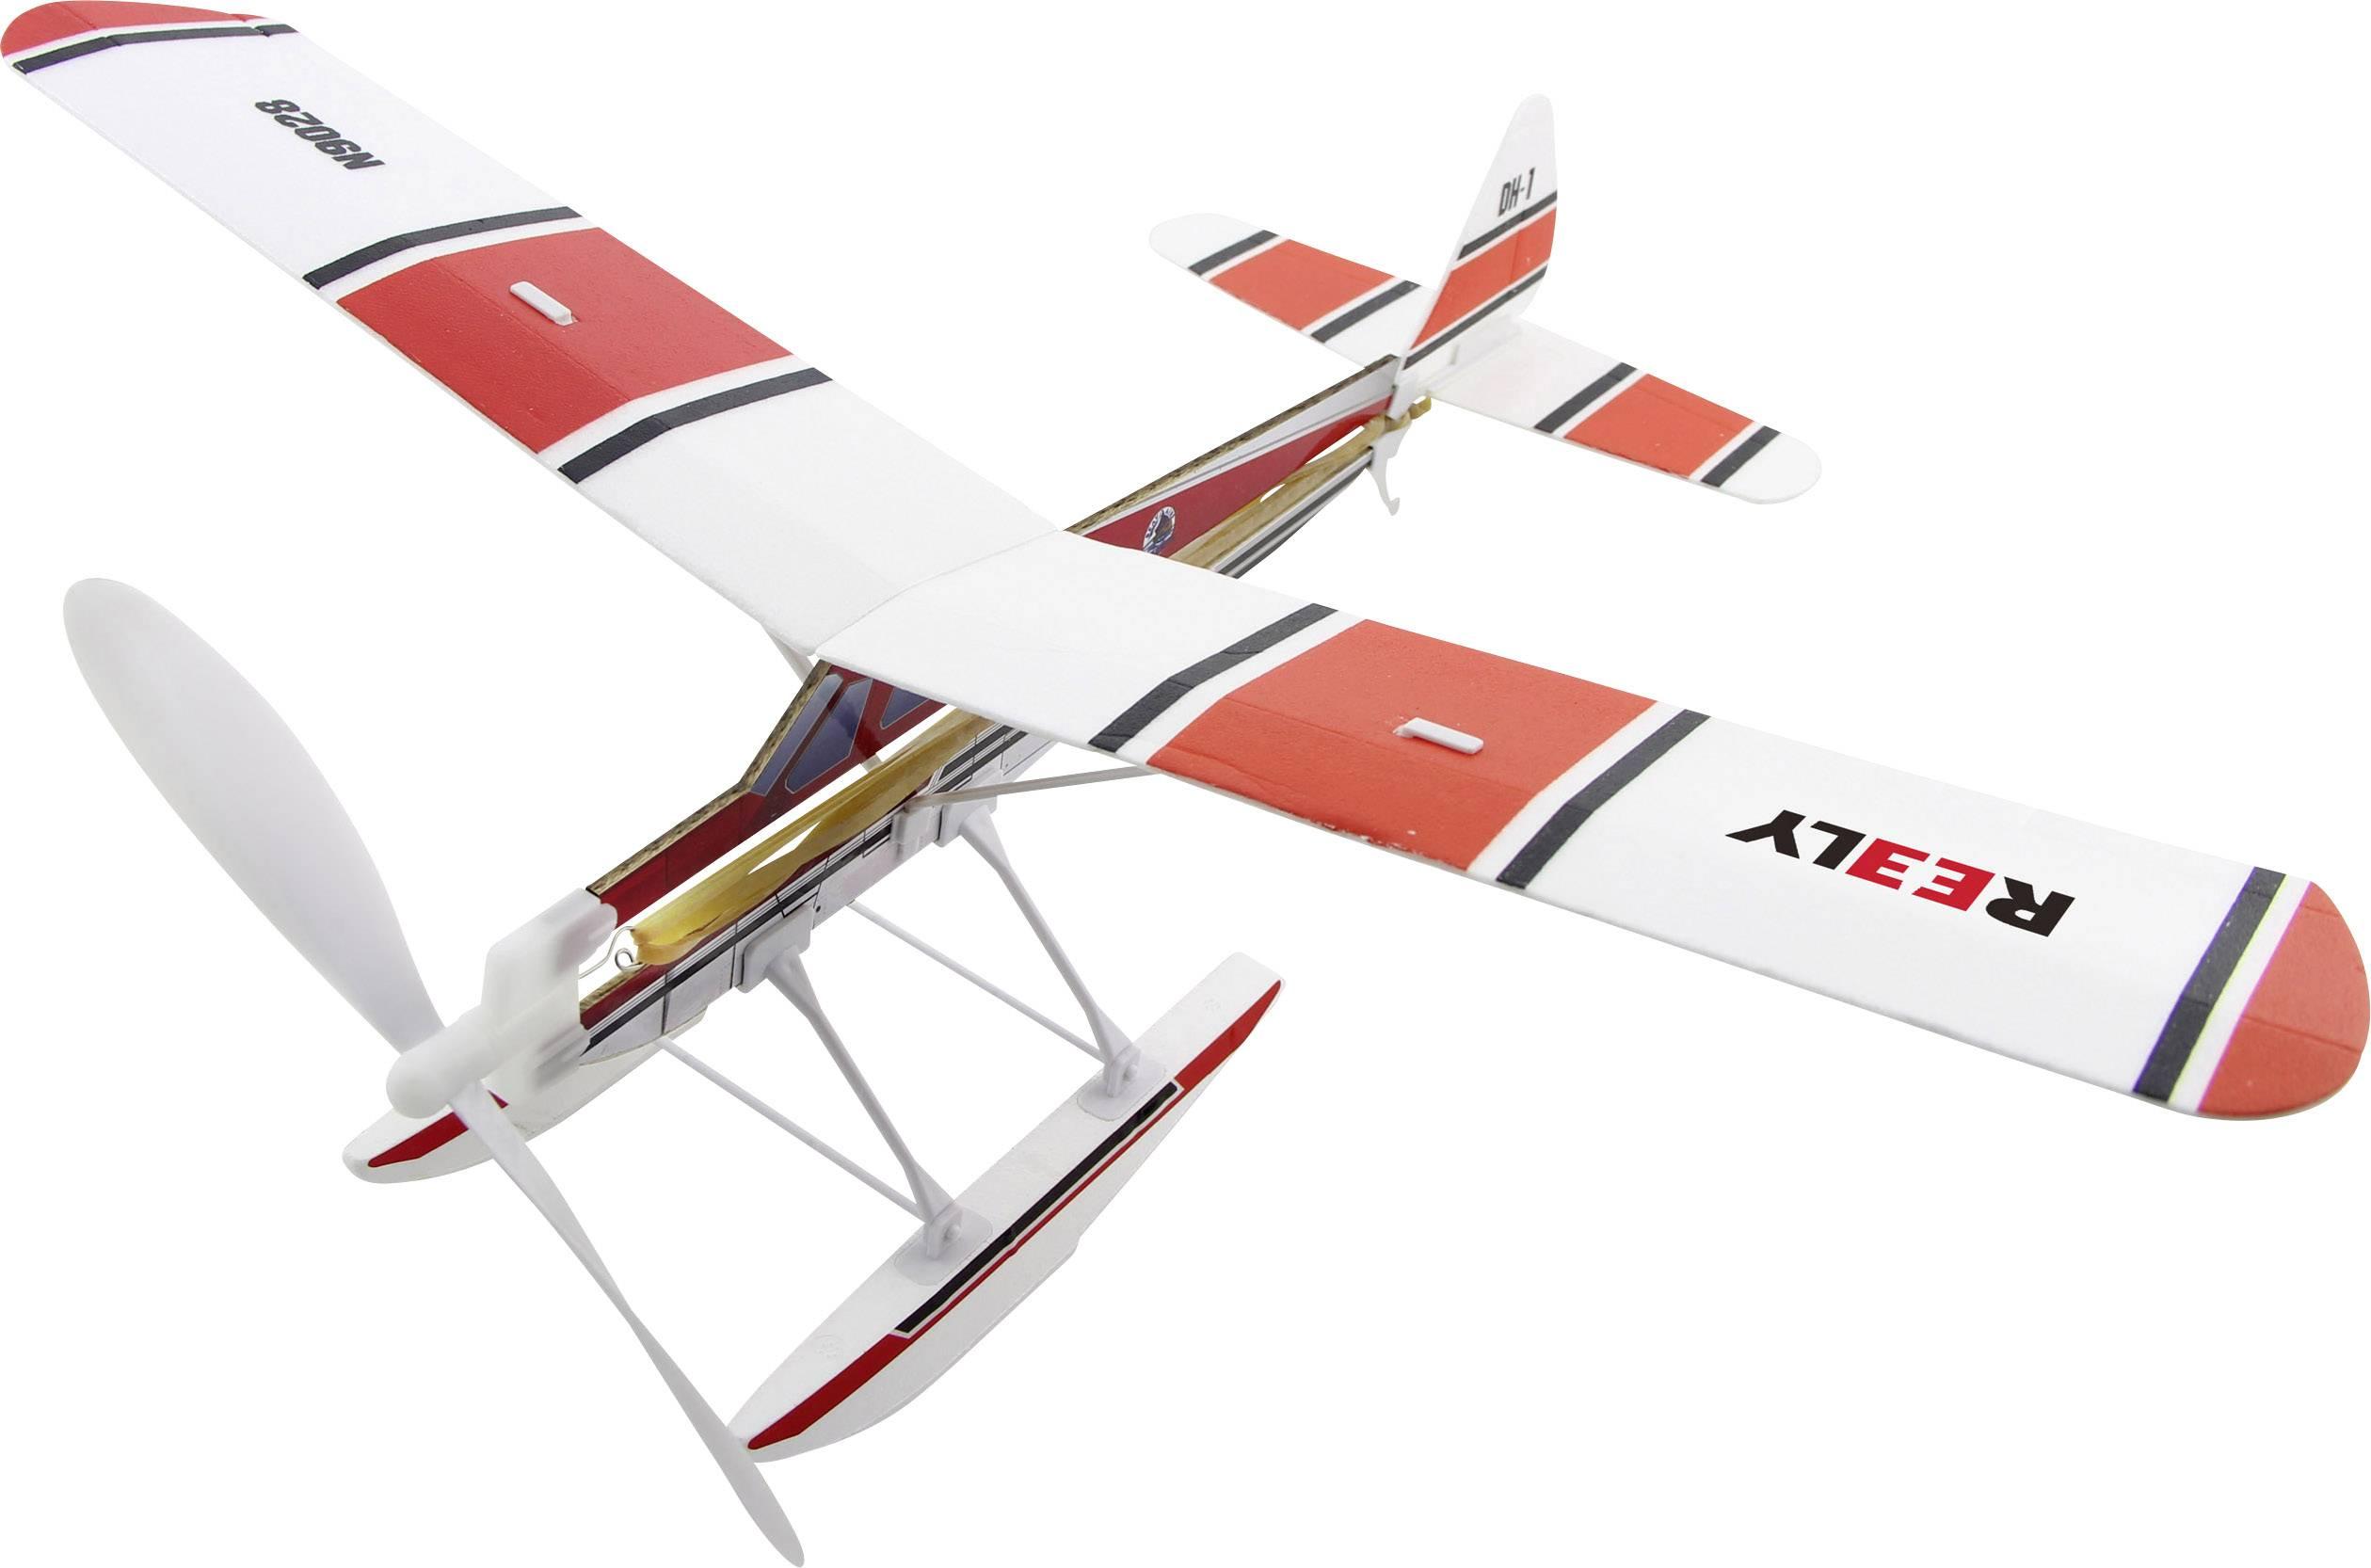 Freestyle akrobatický model lietadla Reely Aviator